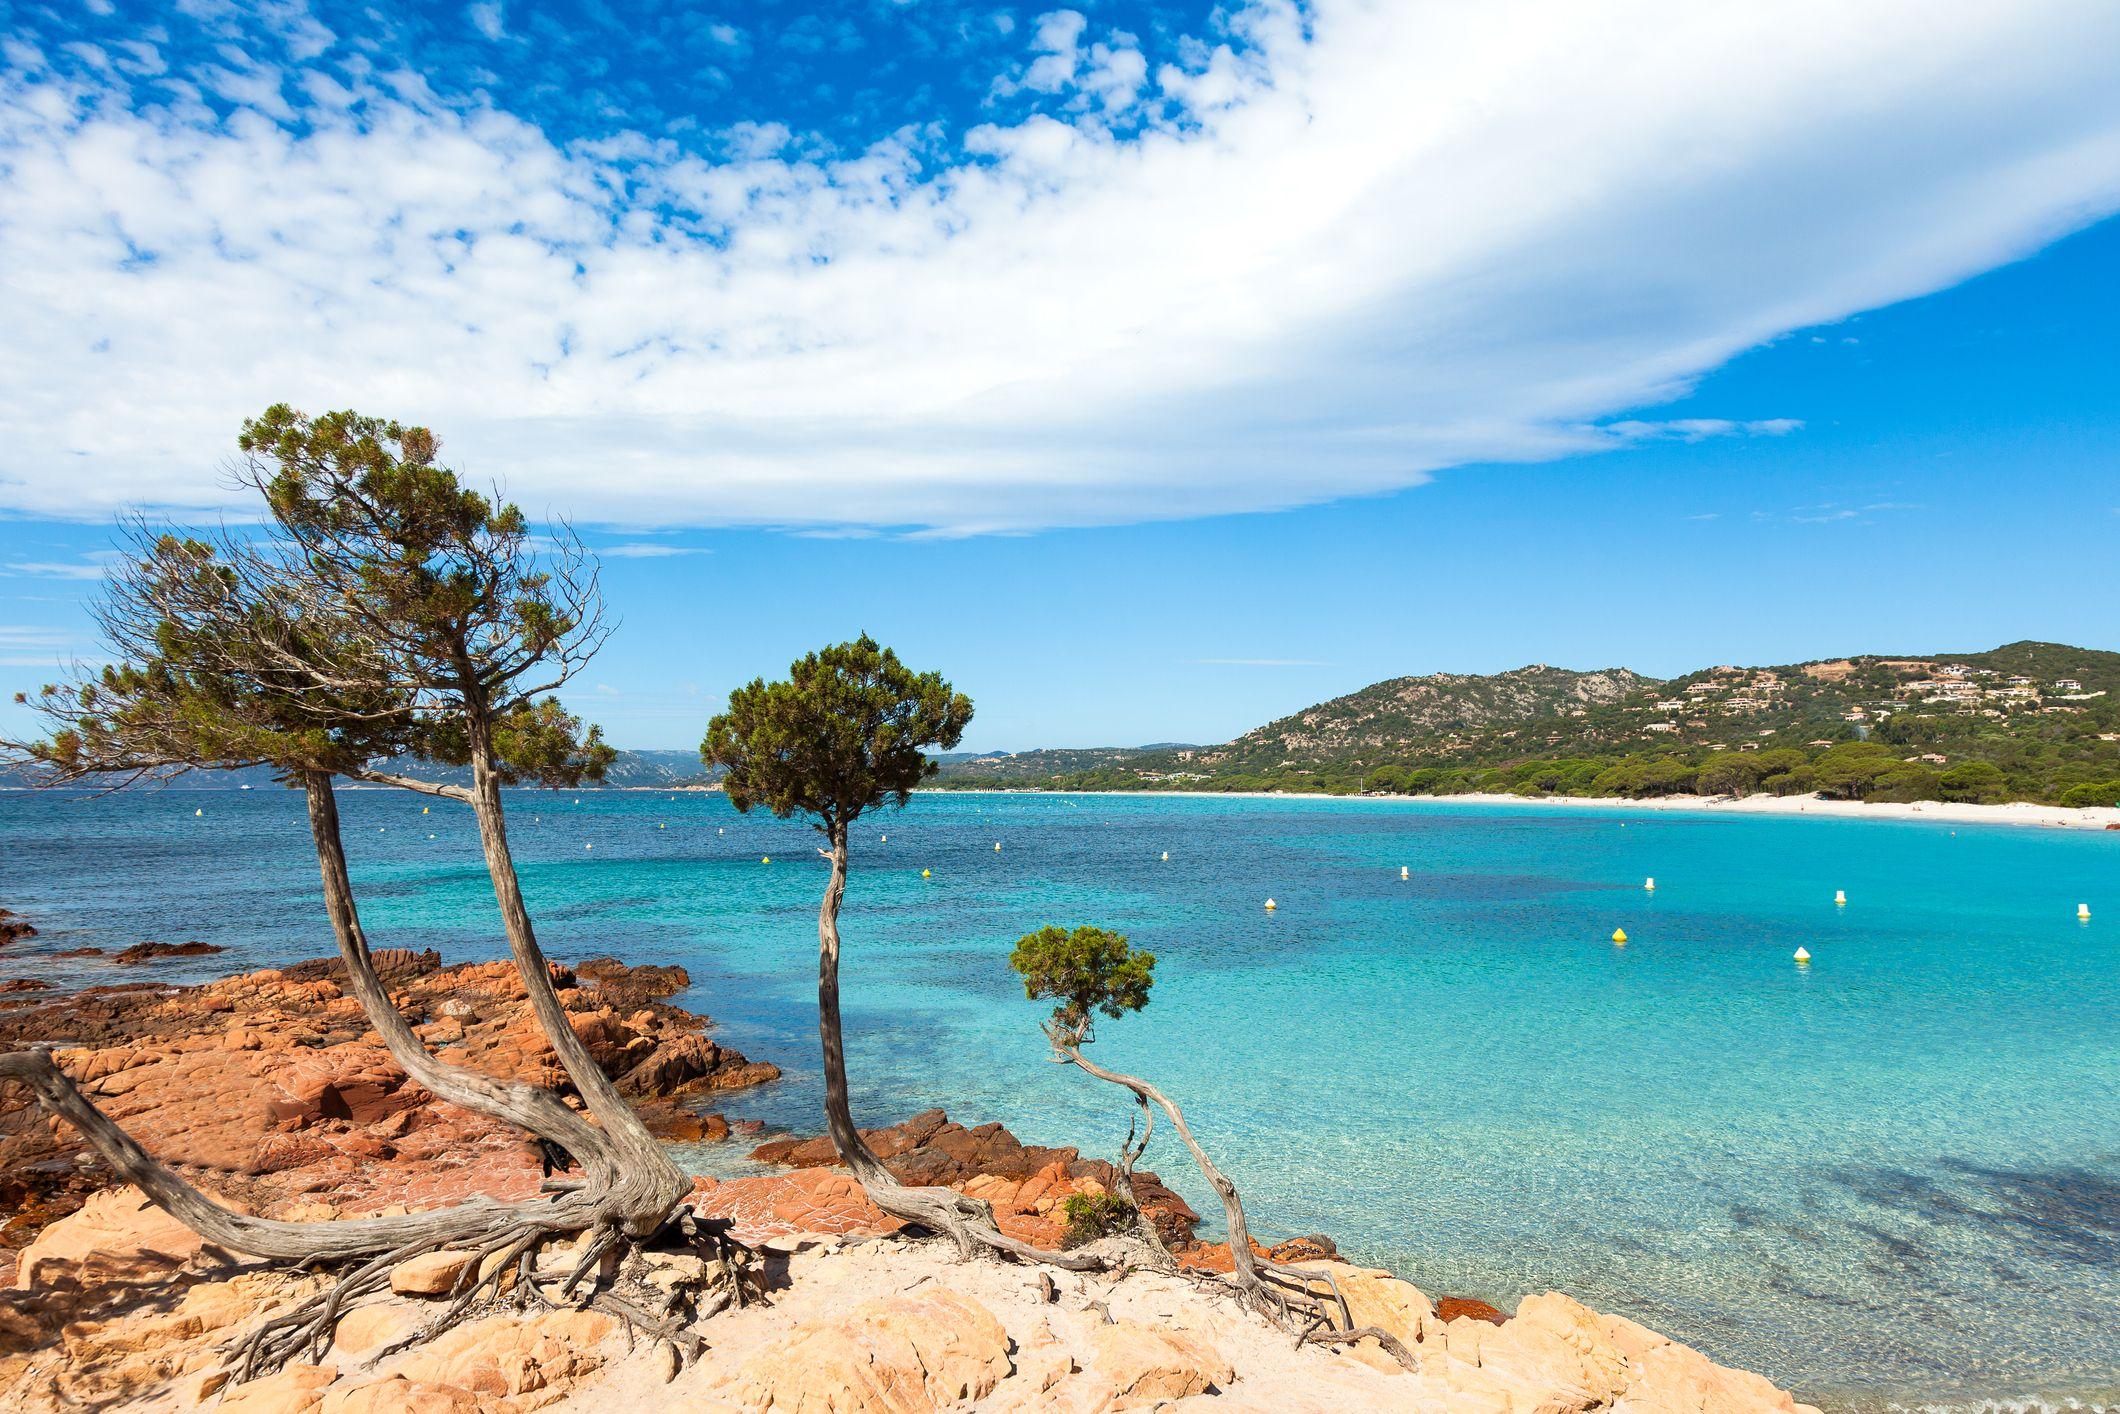 Palombaggia beach Corsica Island France